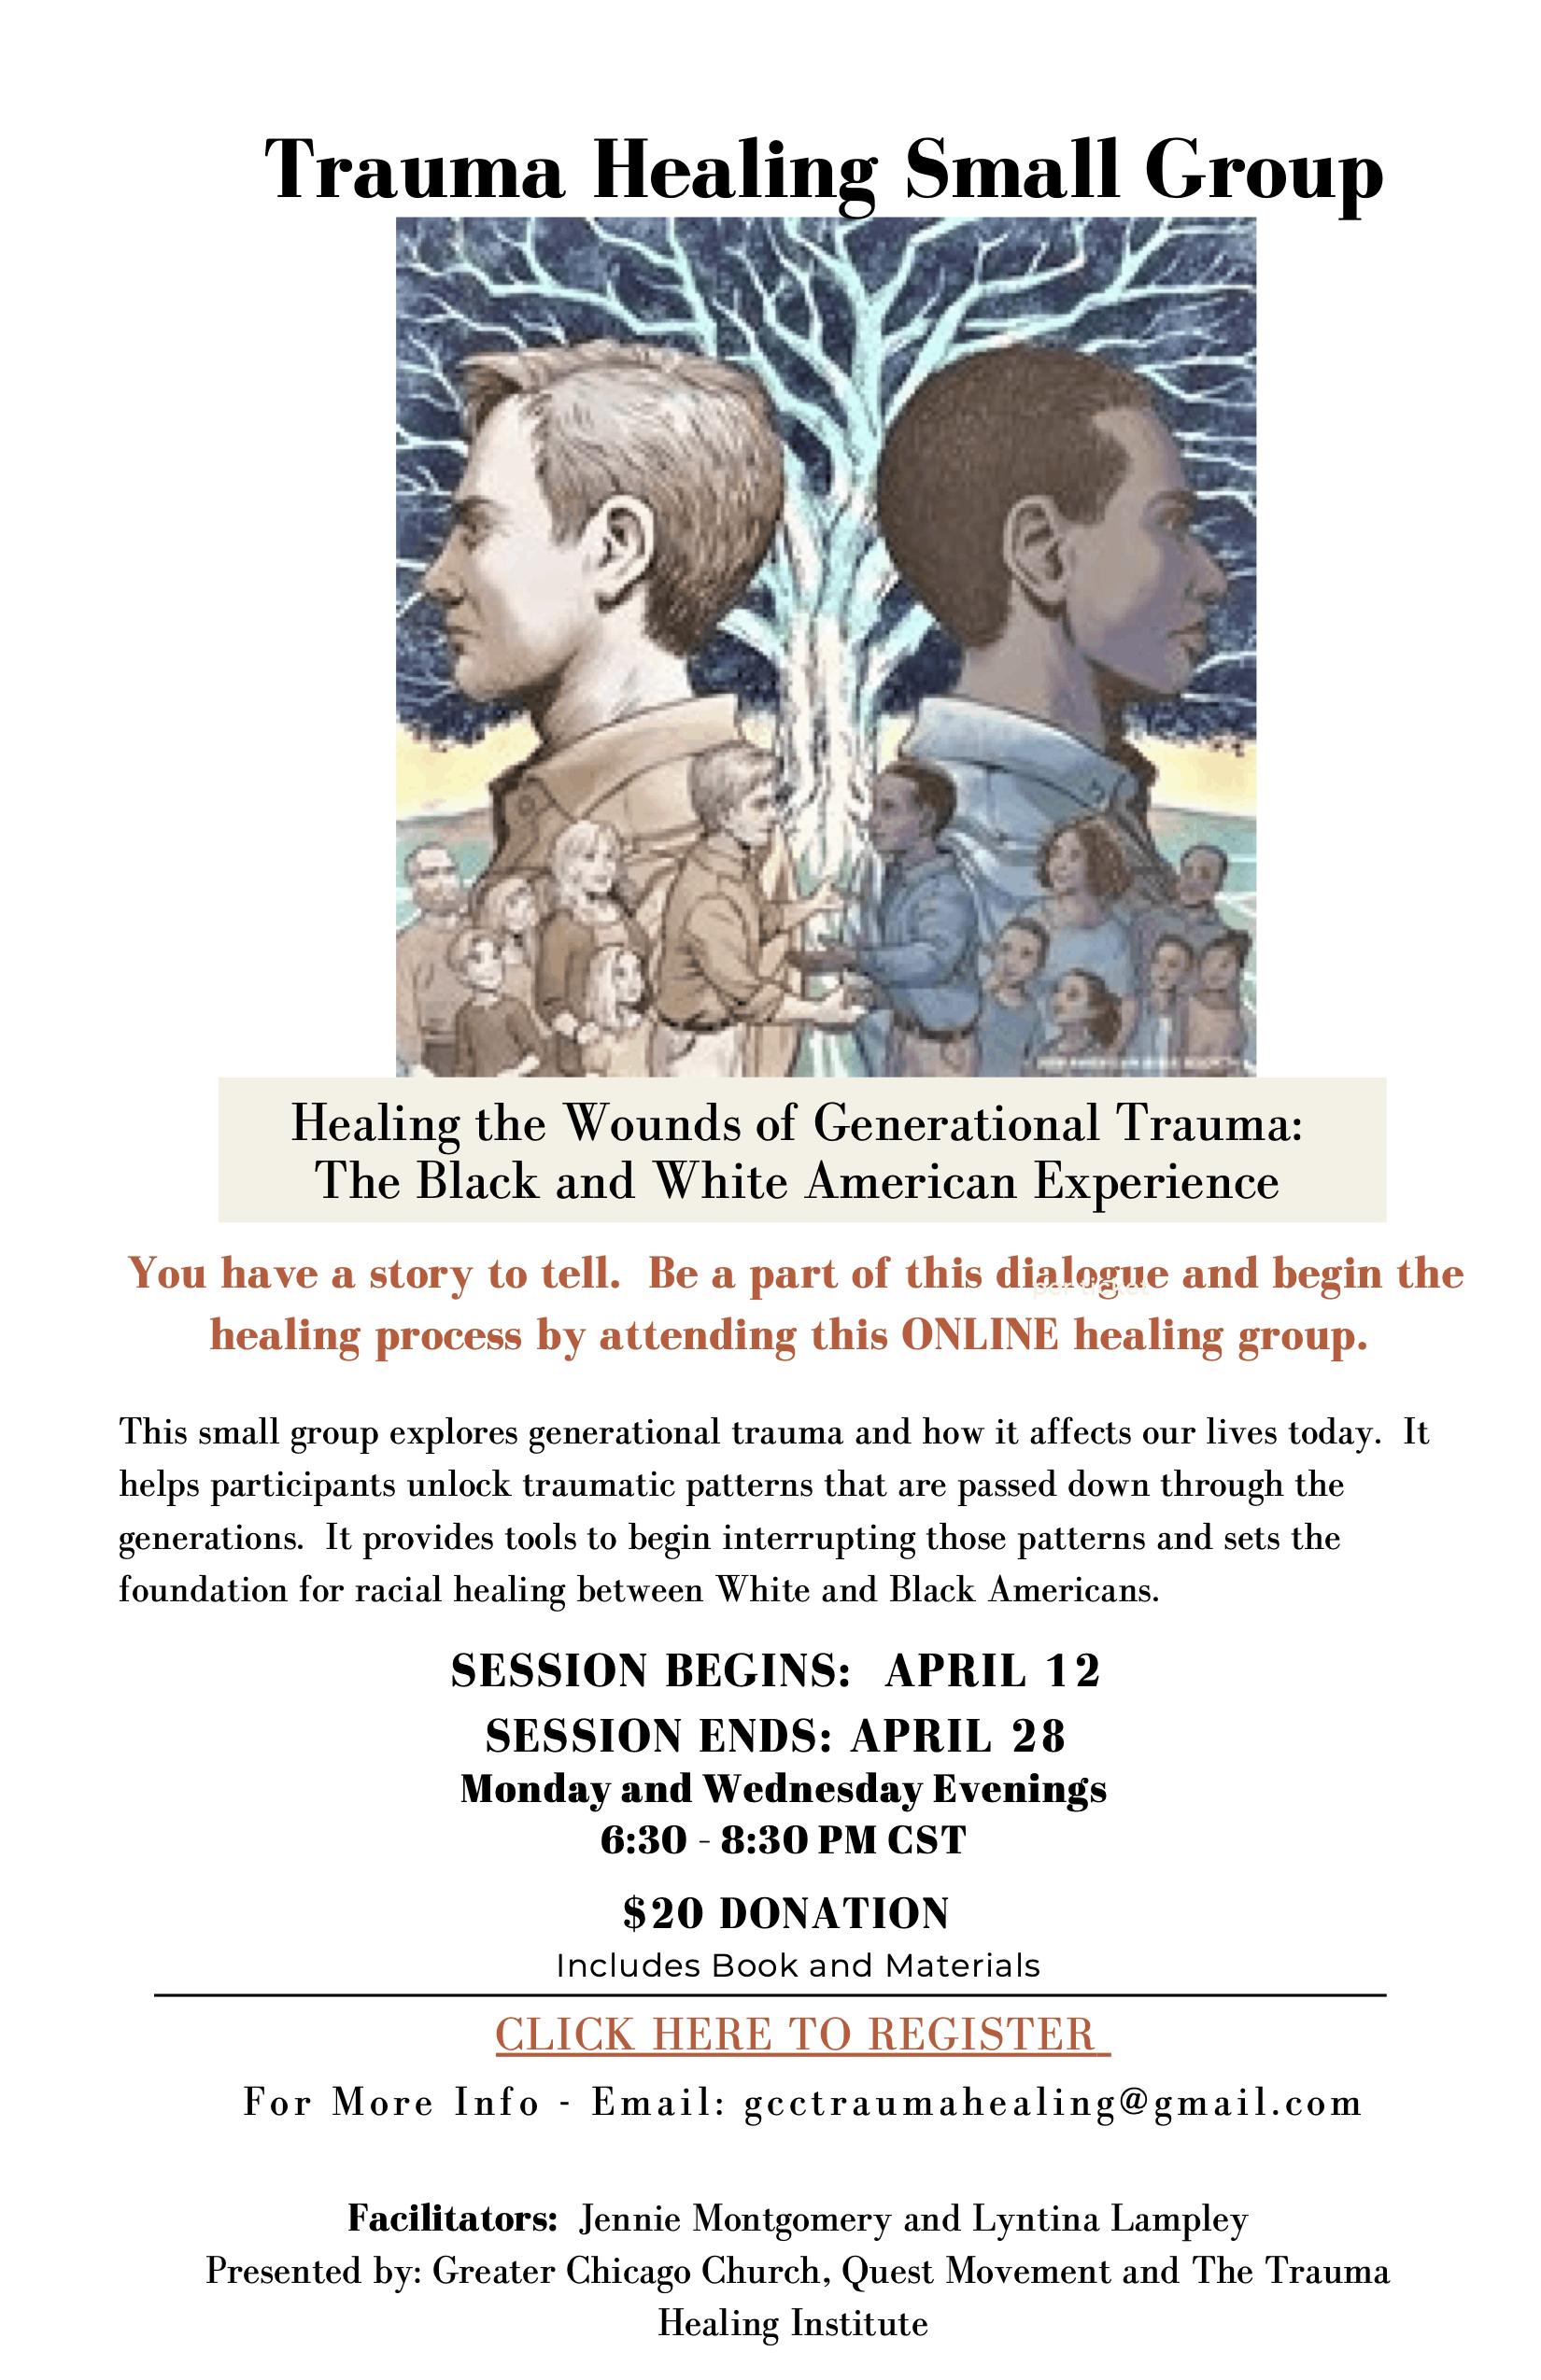 Trauma Healing Small Group